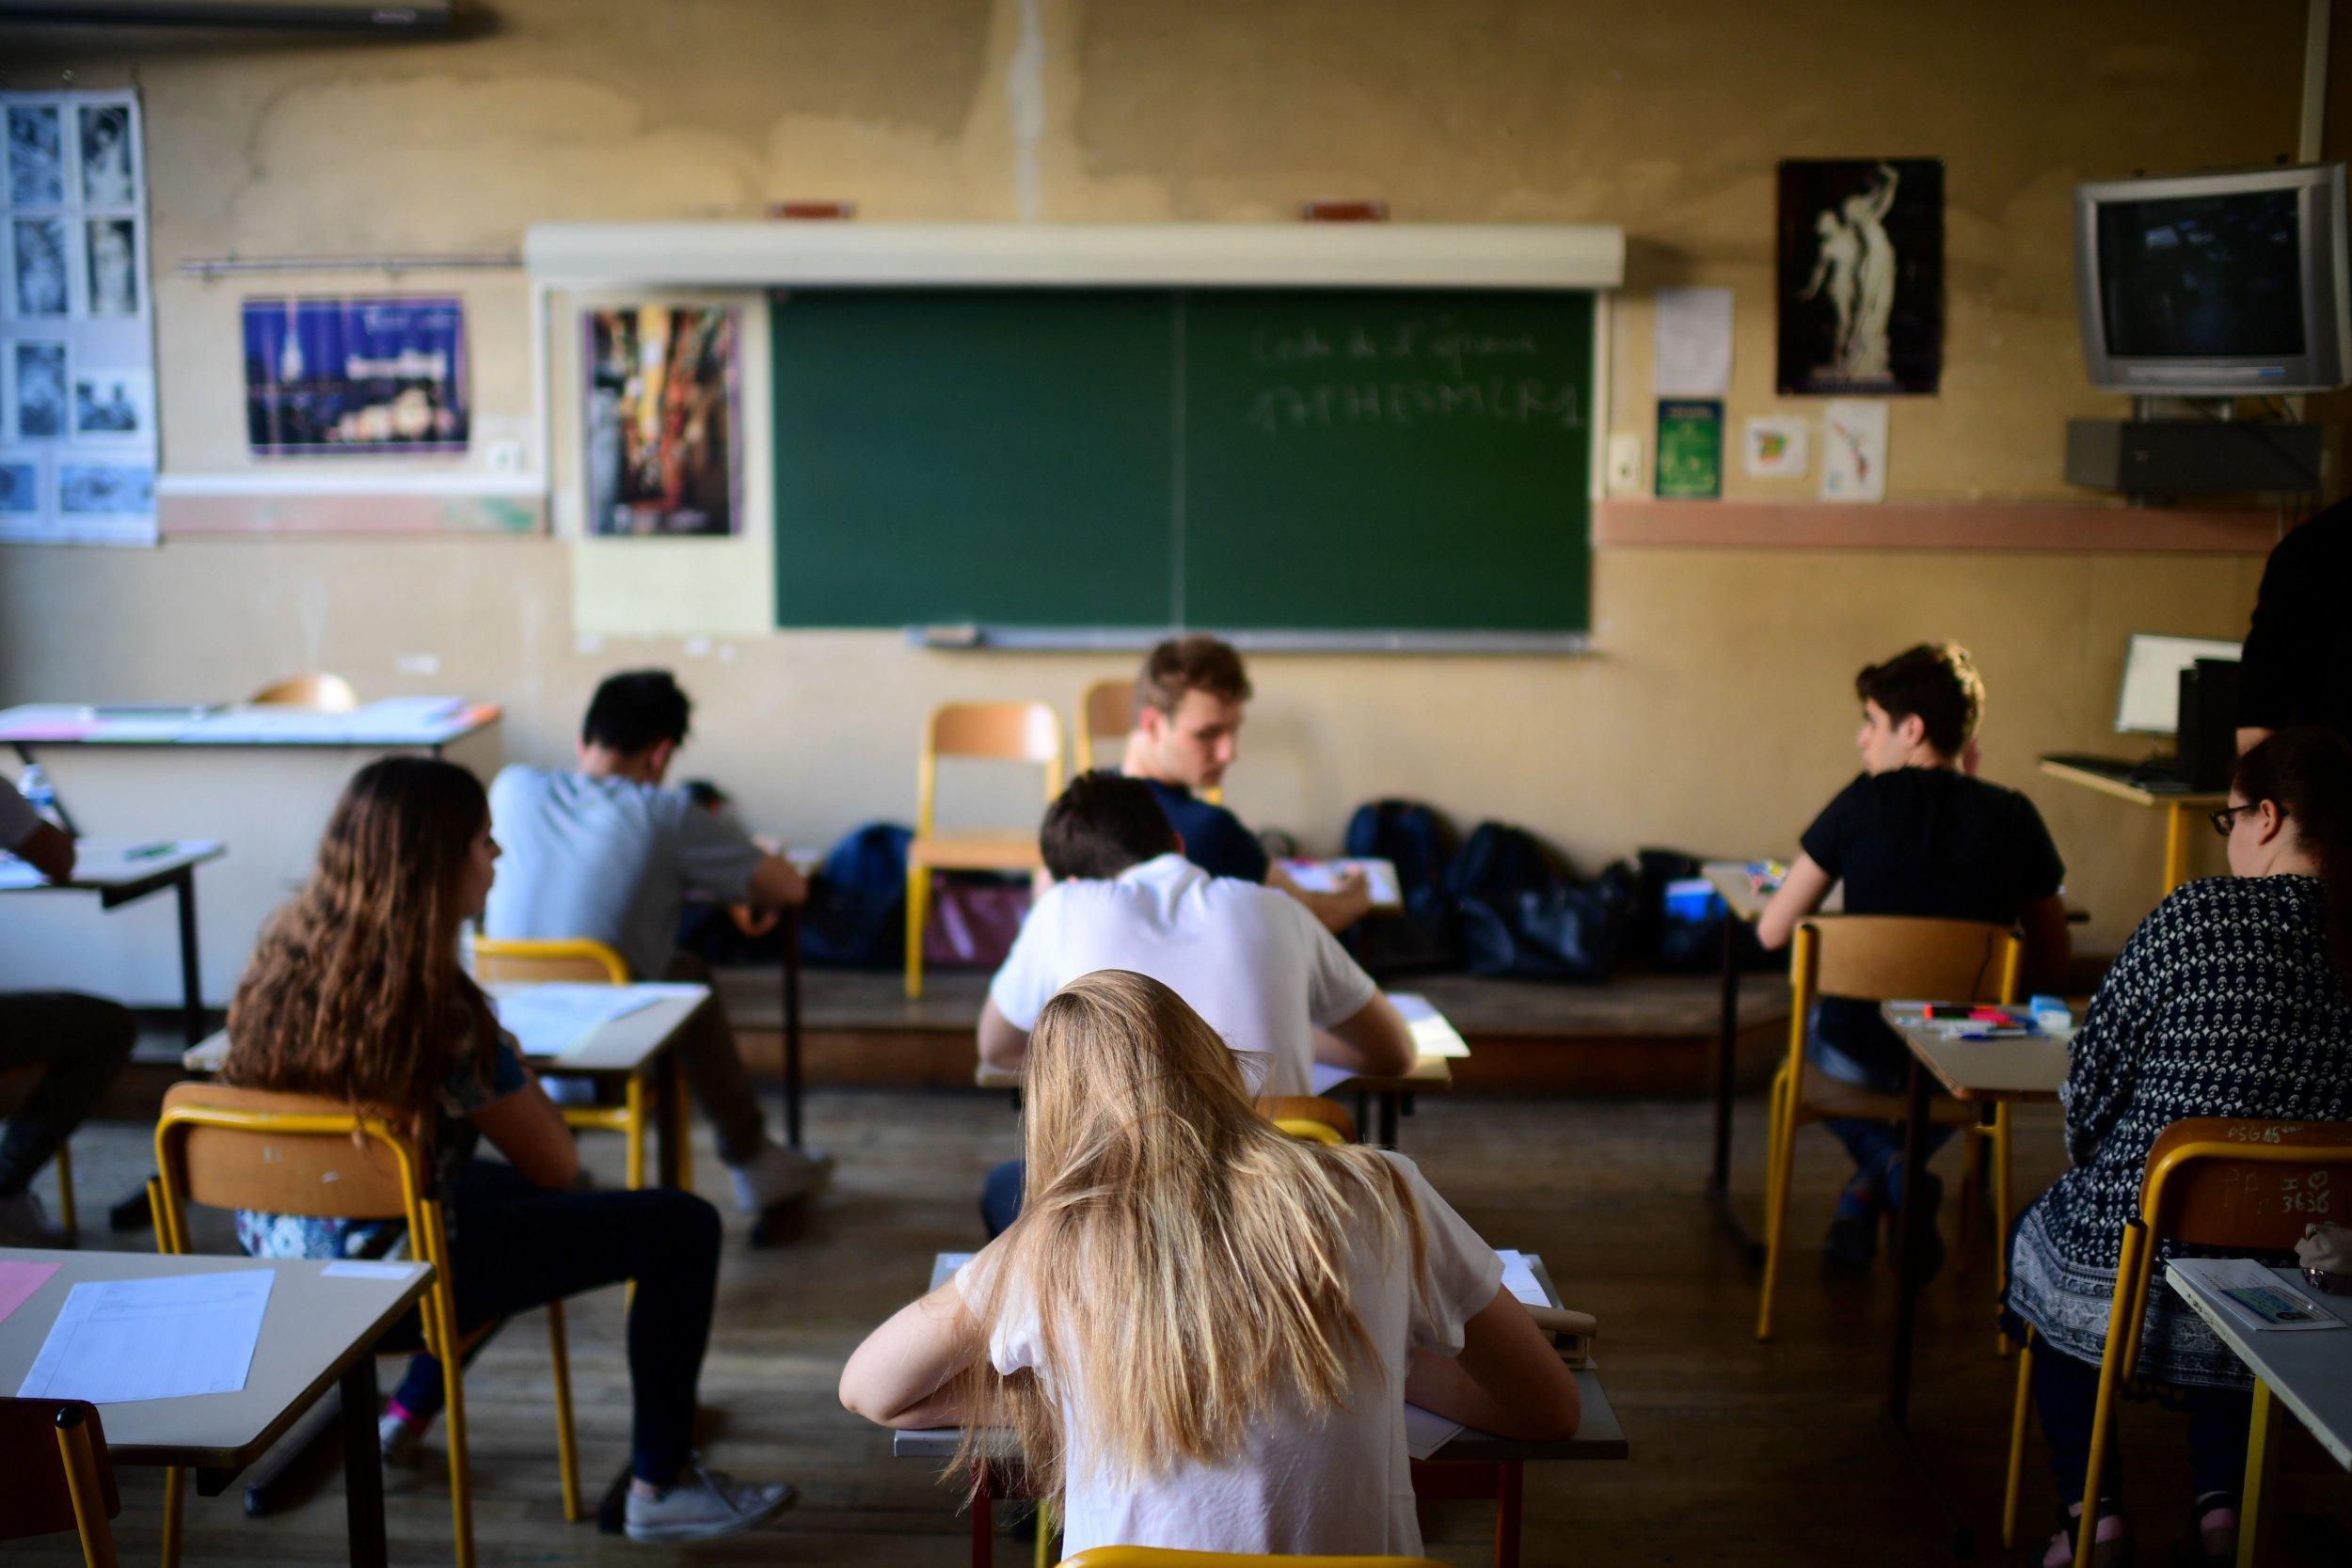 01_Classroom_01